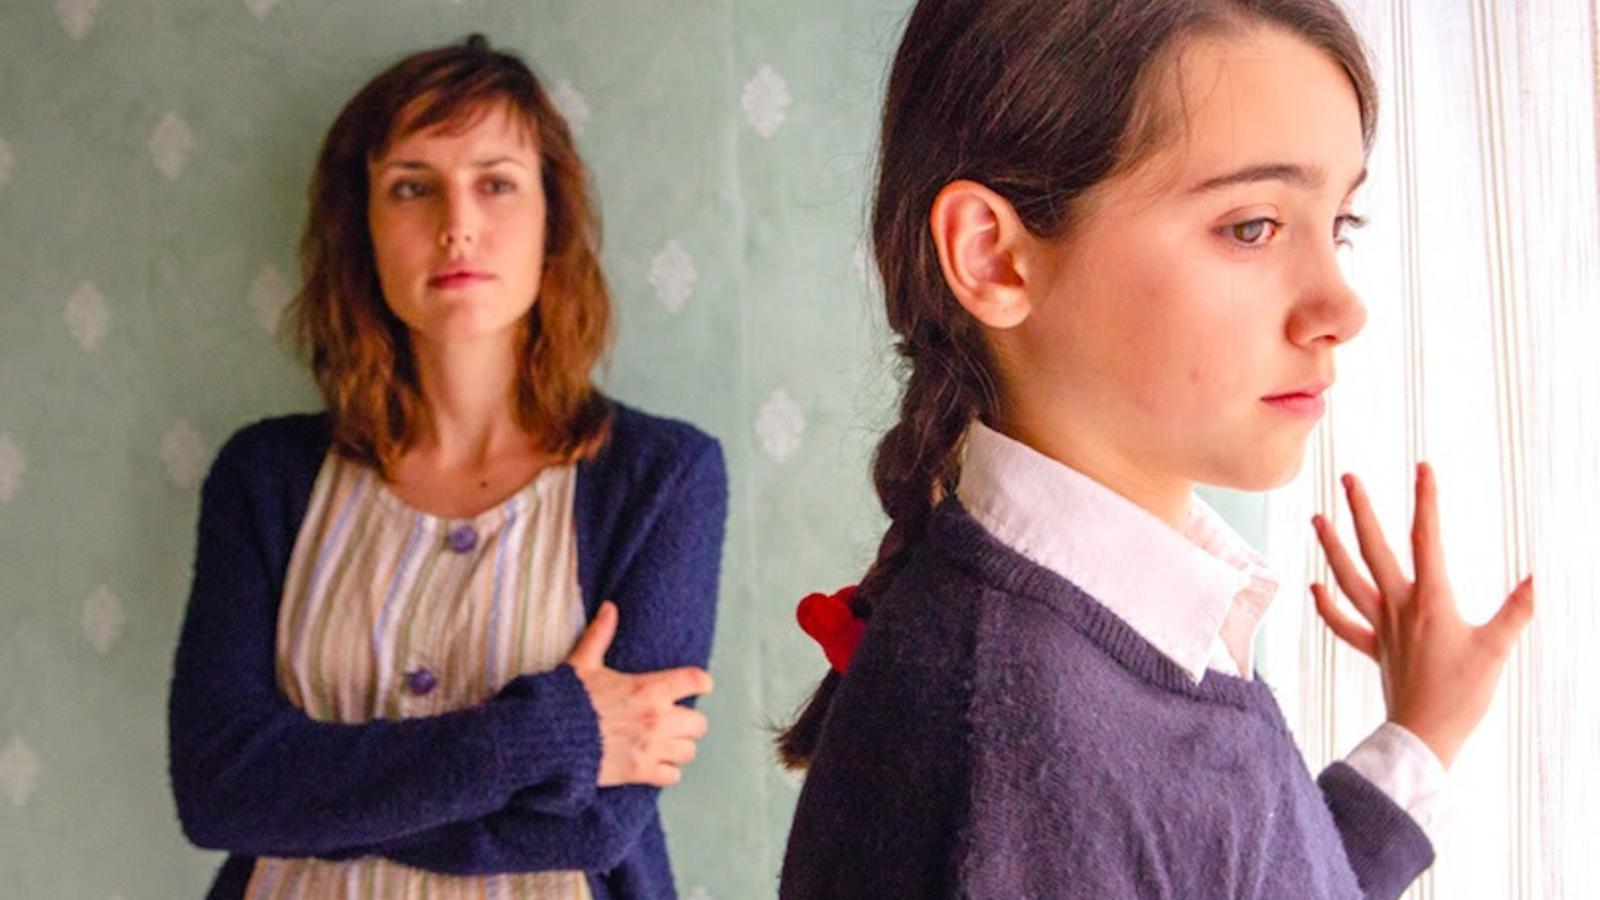 Natalia de Molina i Andrea Fandos a 'Las niñas'